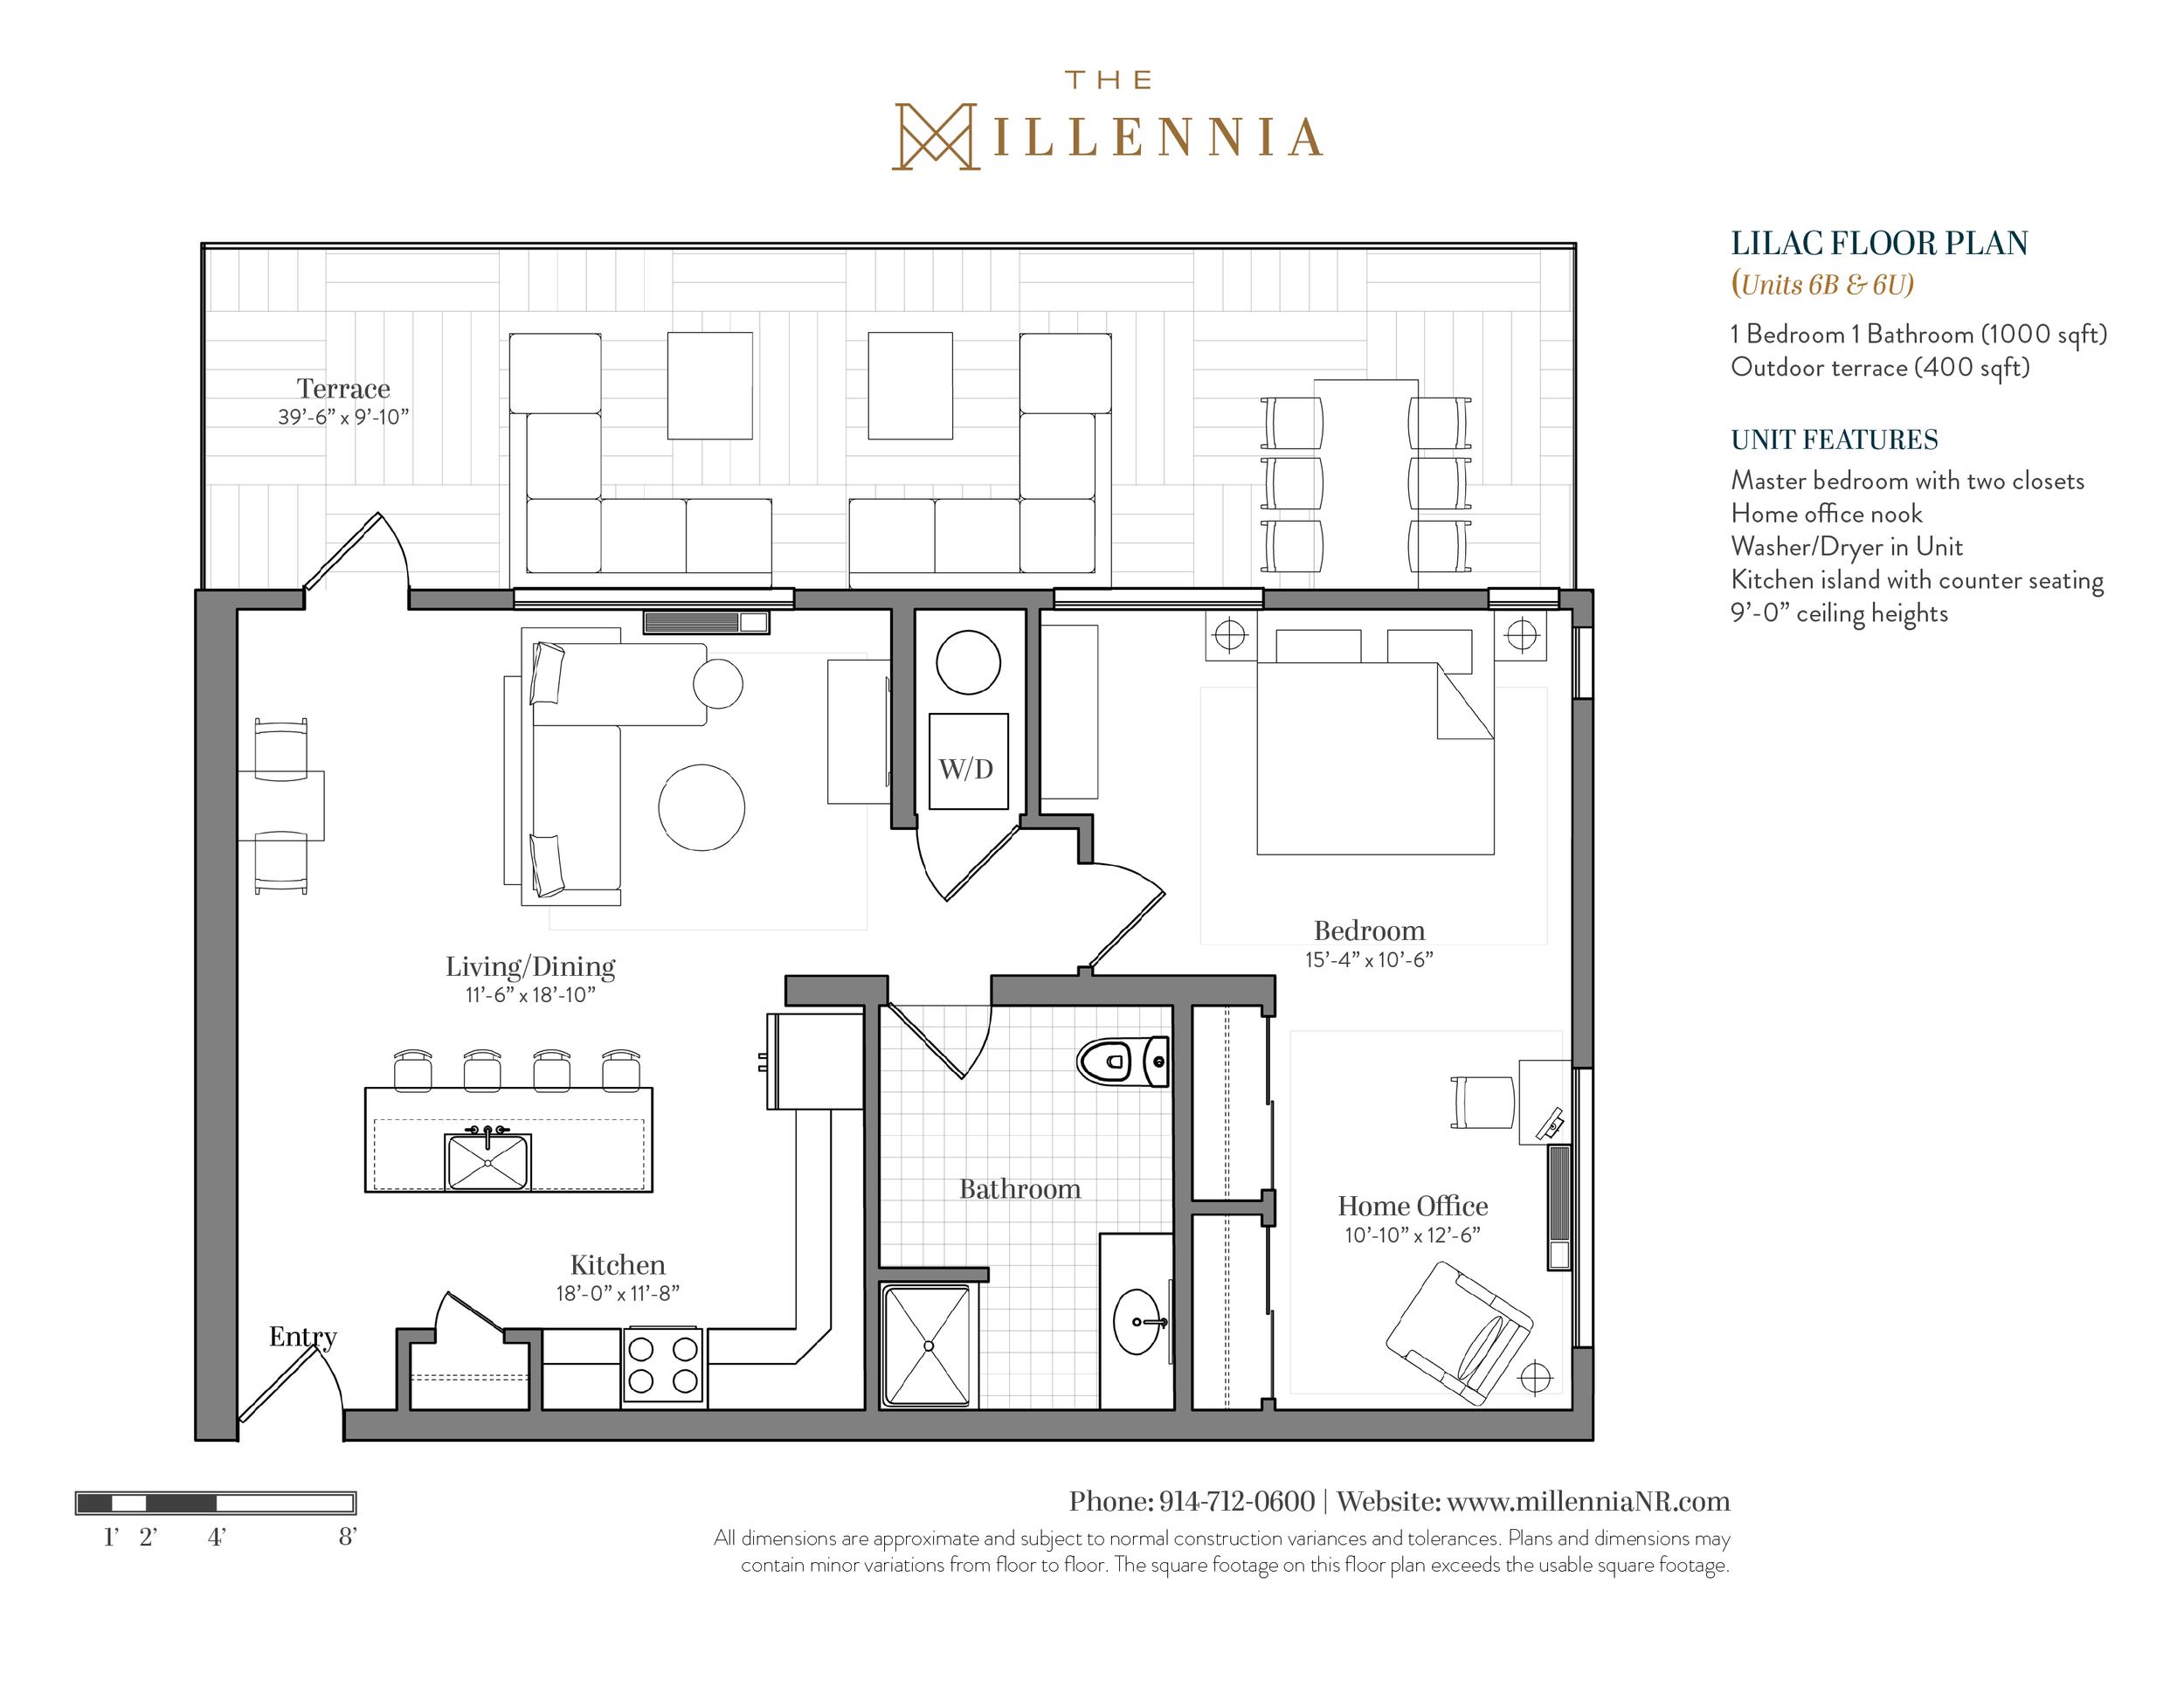 Millennia_Floorplans_Lilac.png